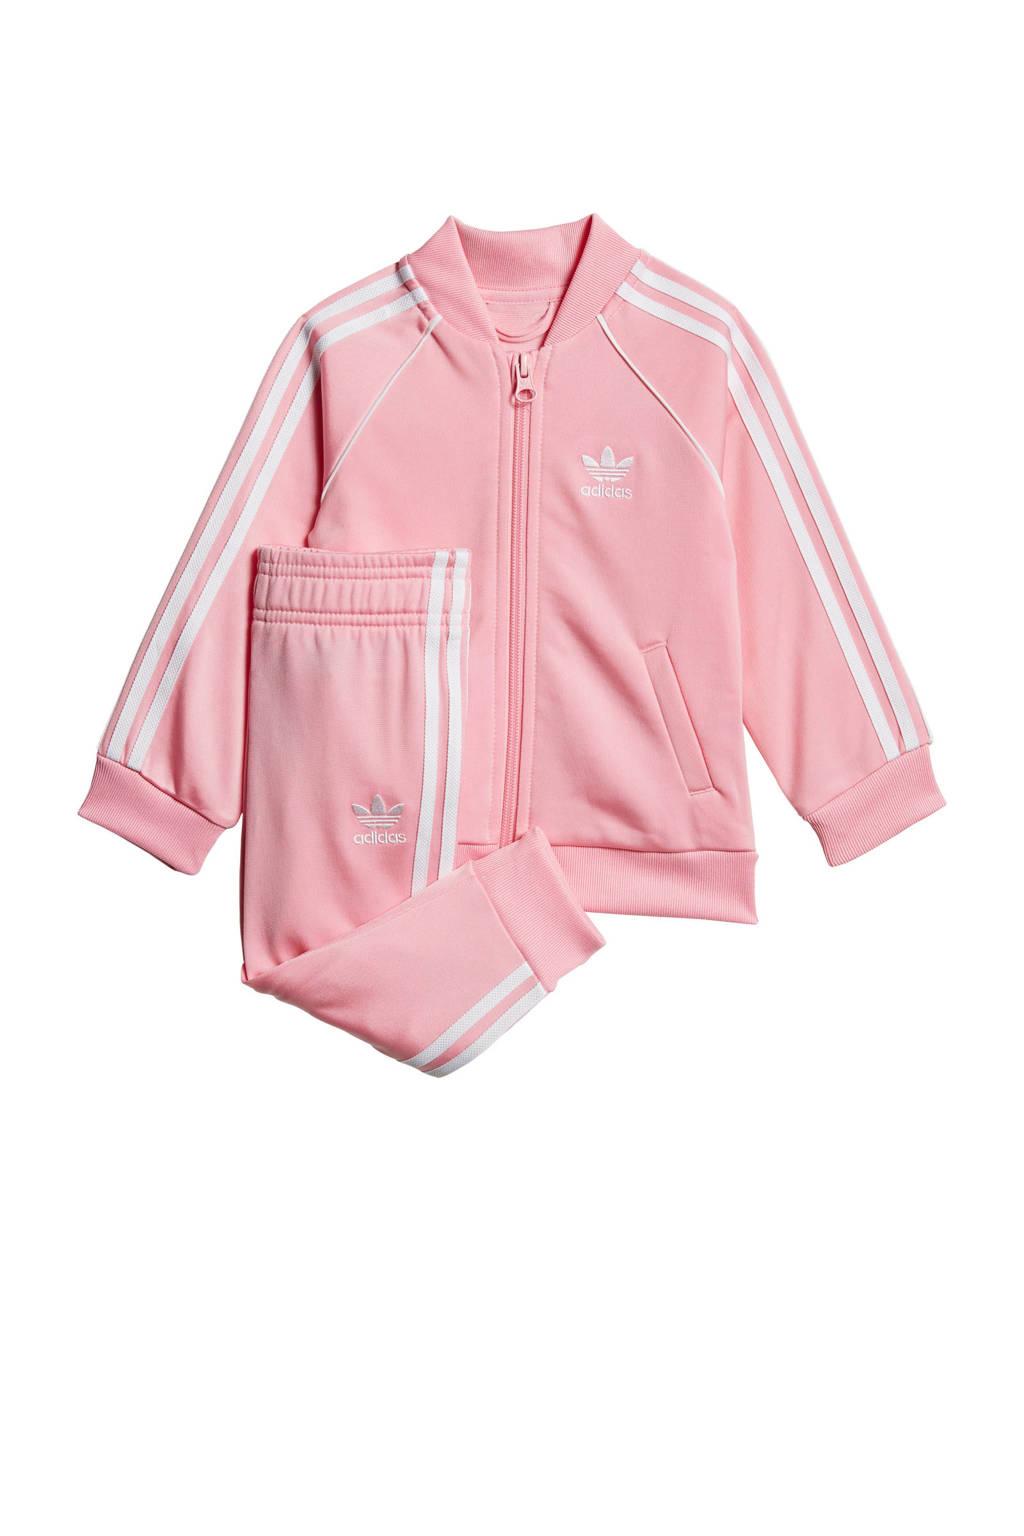 adidas Originals   trainingspak roze, Roze